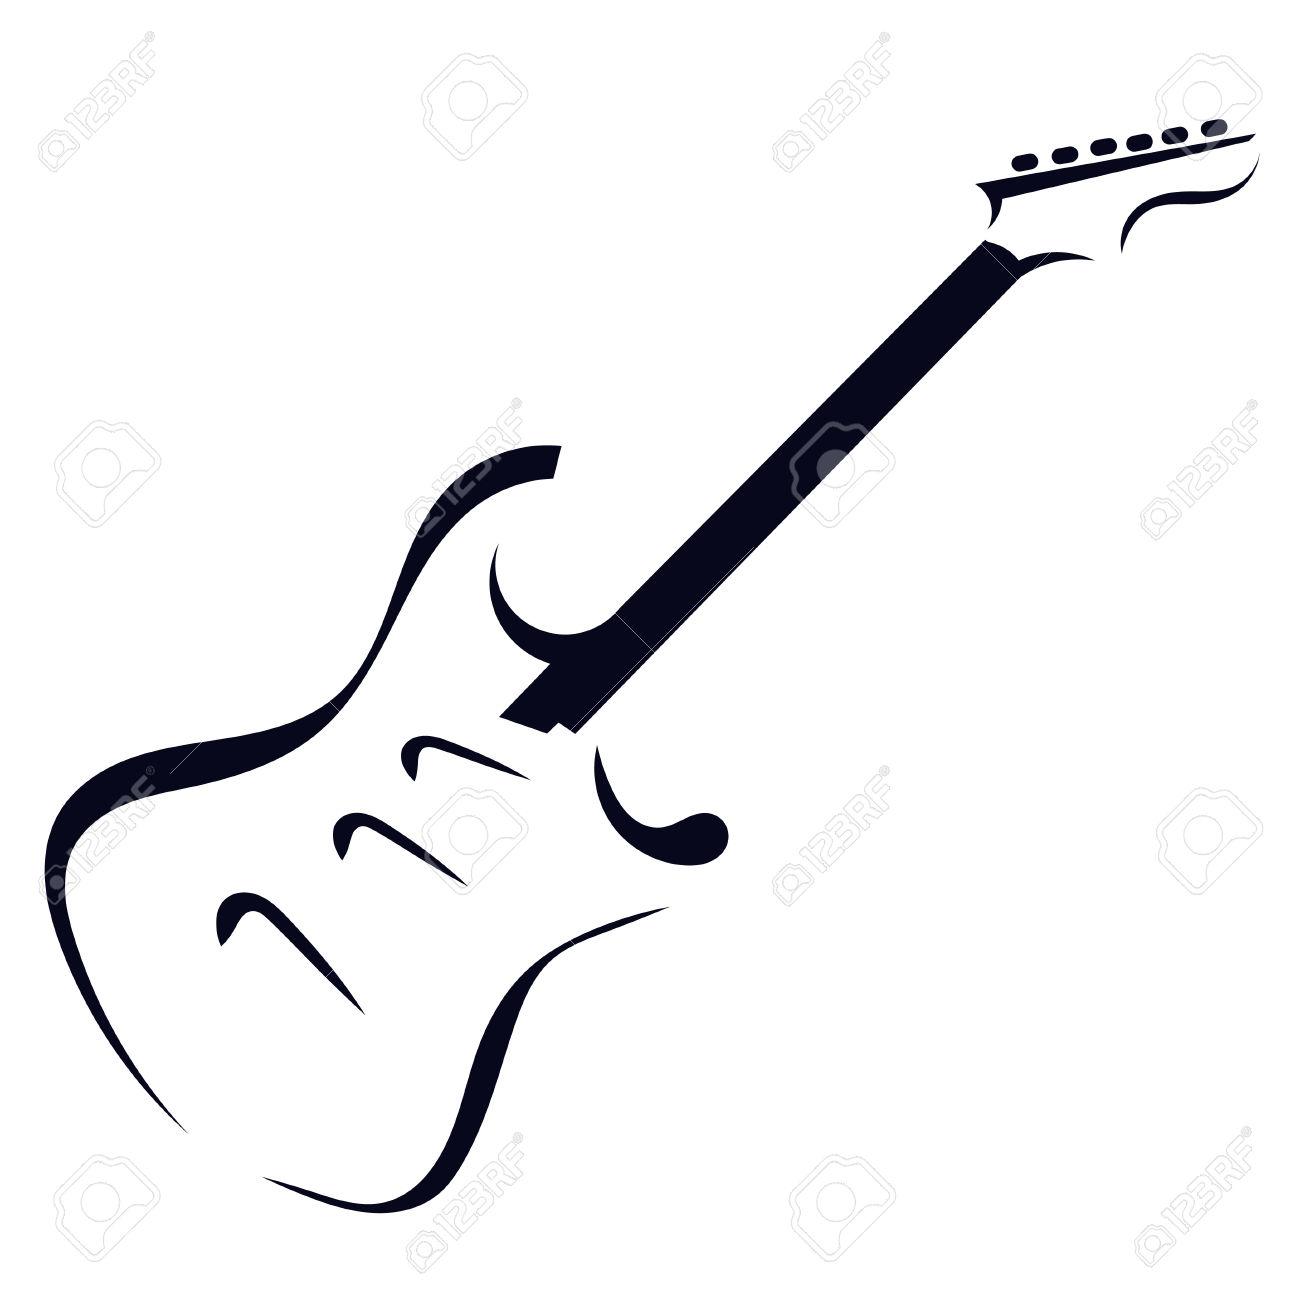 1300x1300 Guitar Clipart Guitar Neck